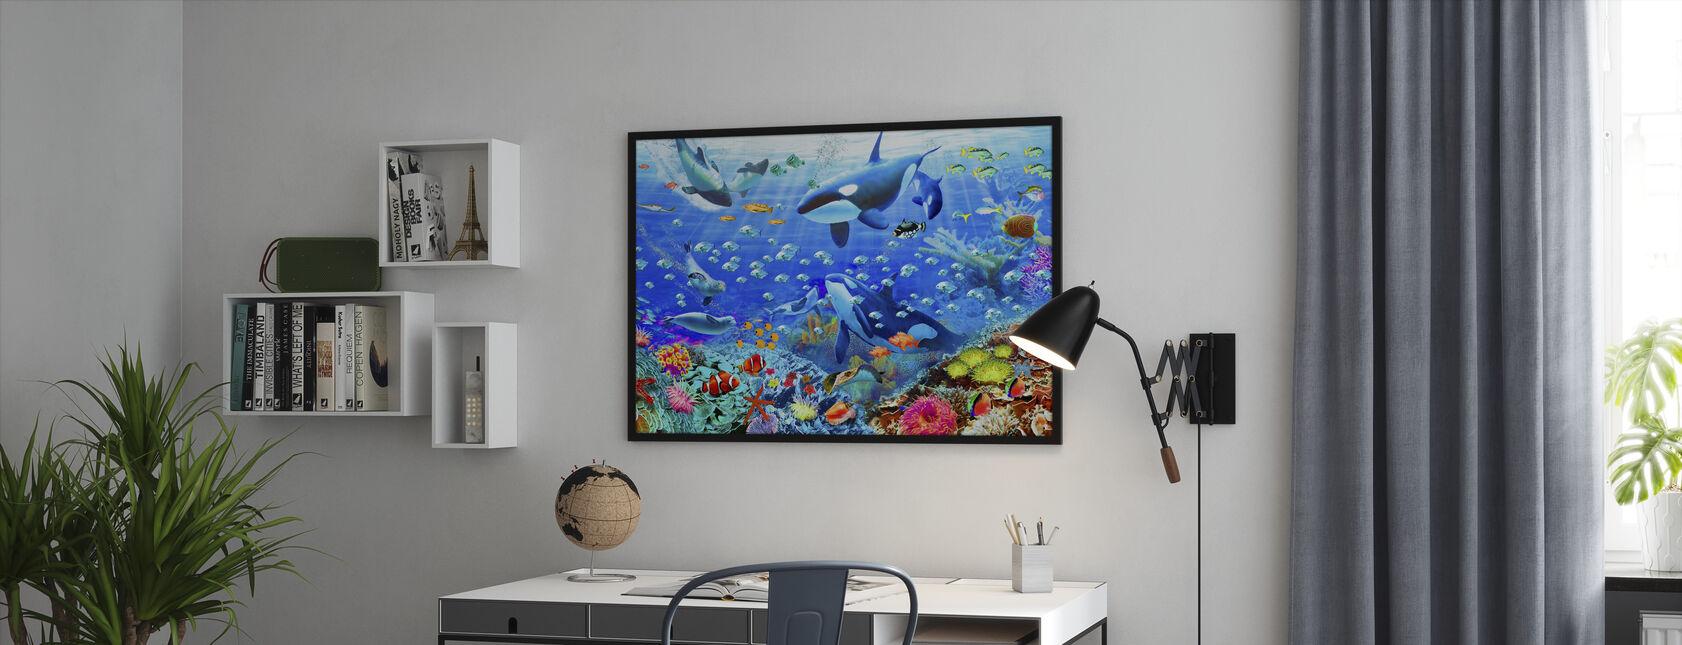 Underwater Panorama - Framed print - Office